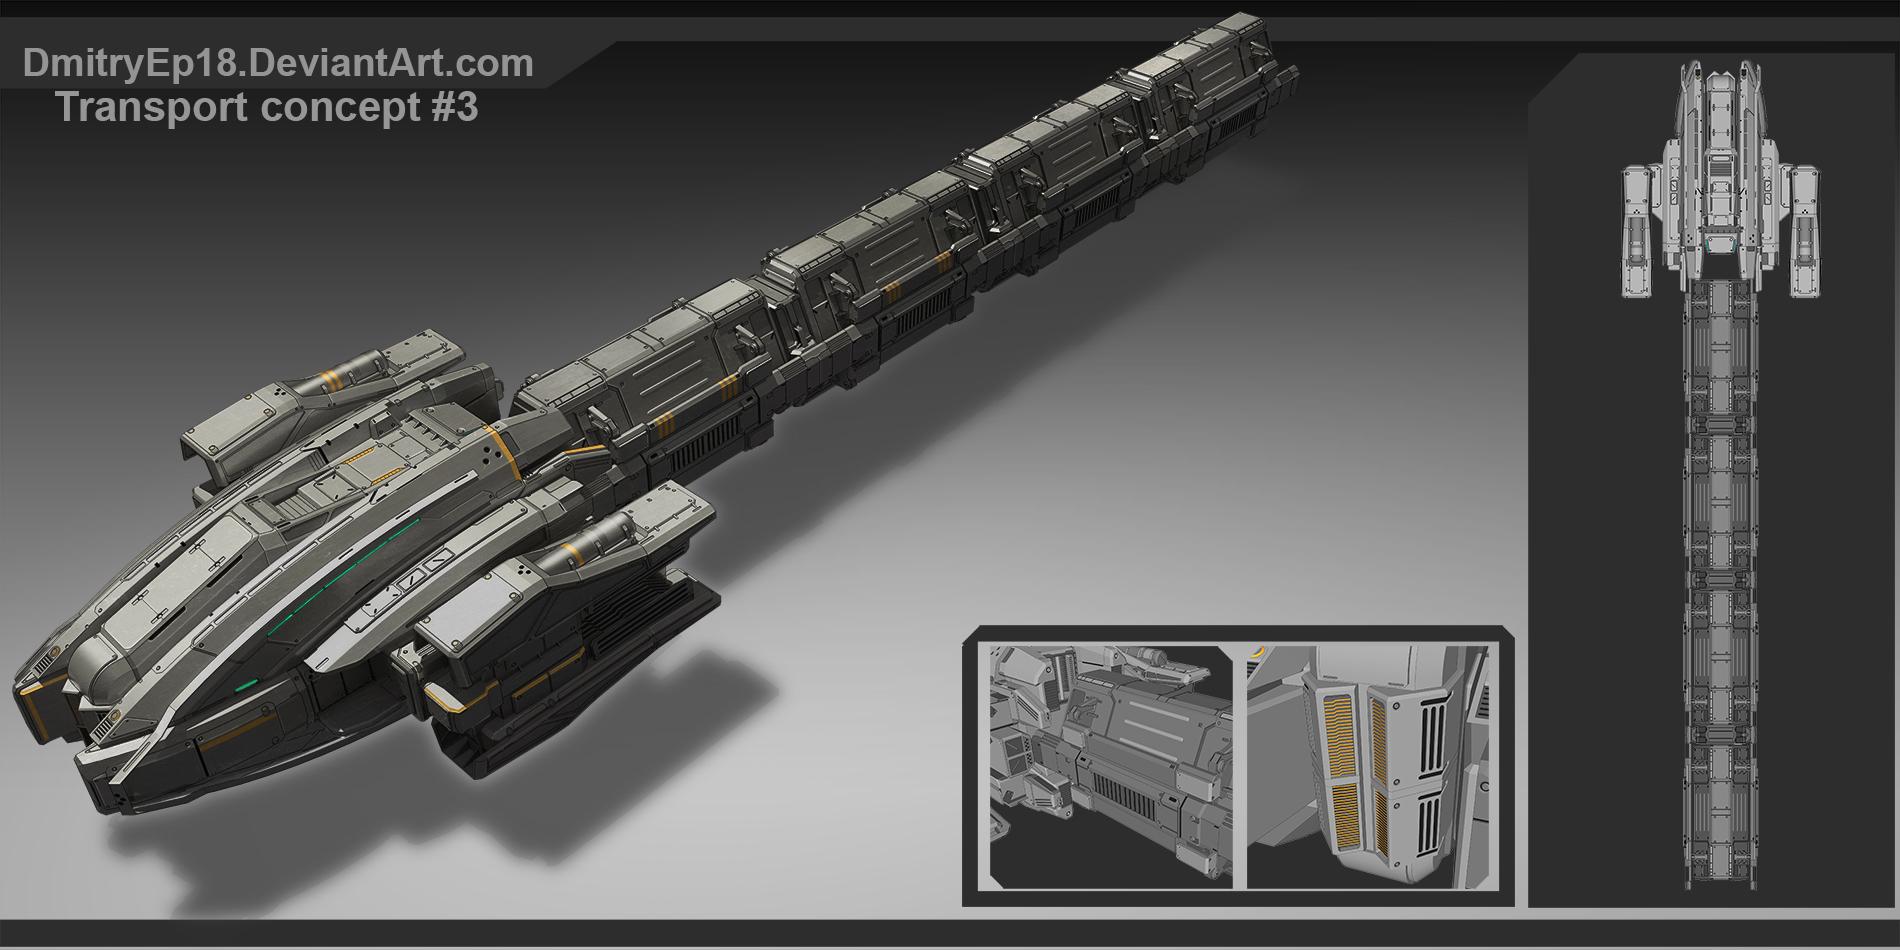 Alien transport concept by DmitryEp18